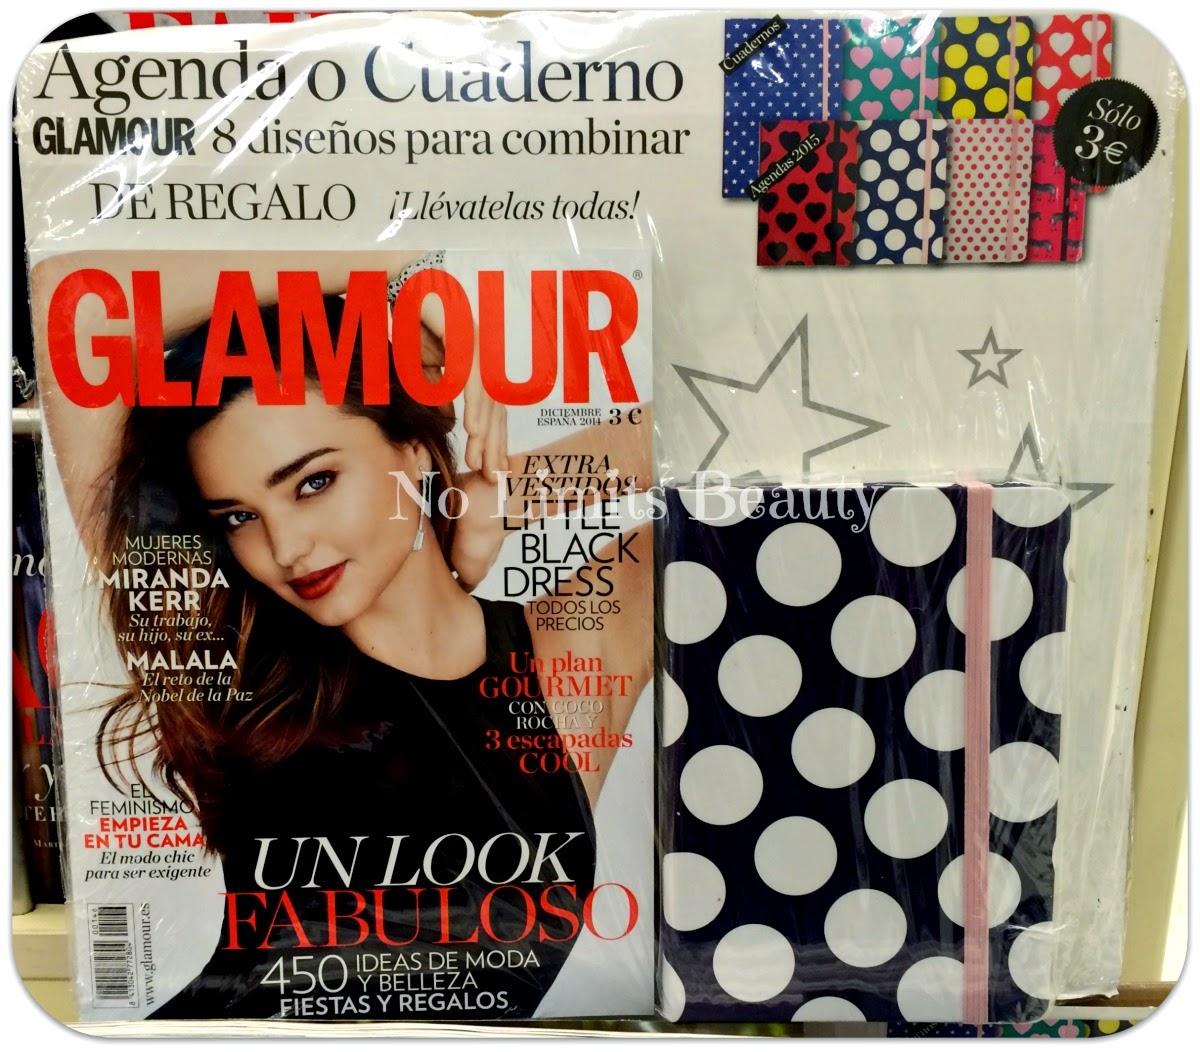 Regalos revistas Diciembre 2014: Glamour